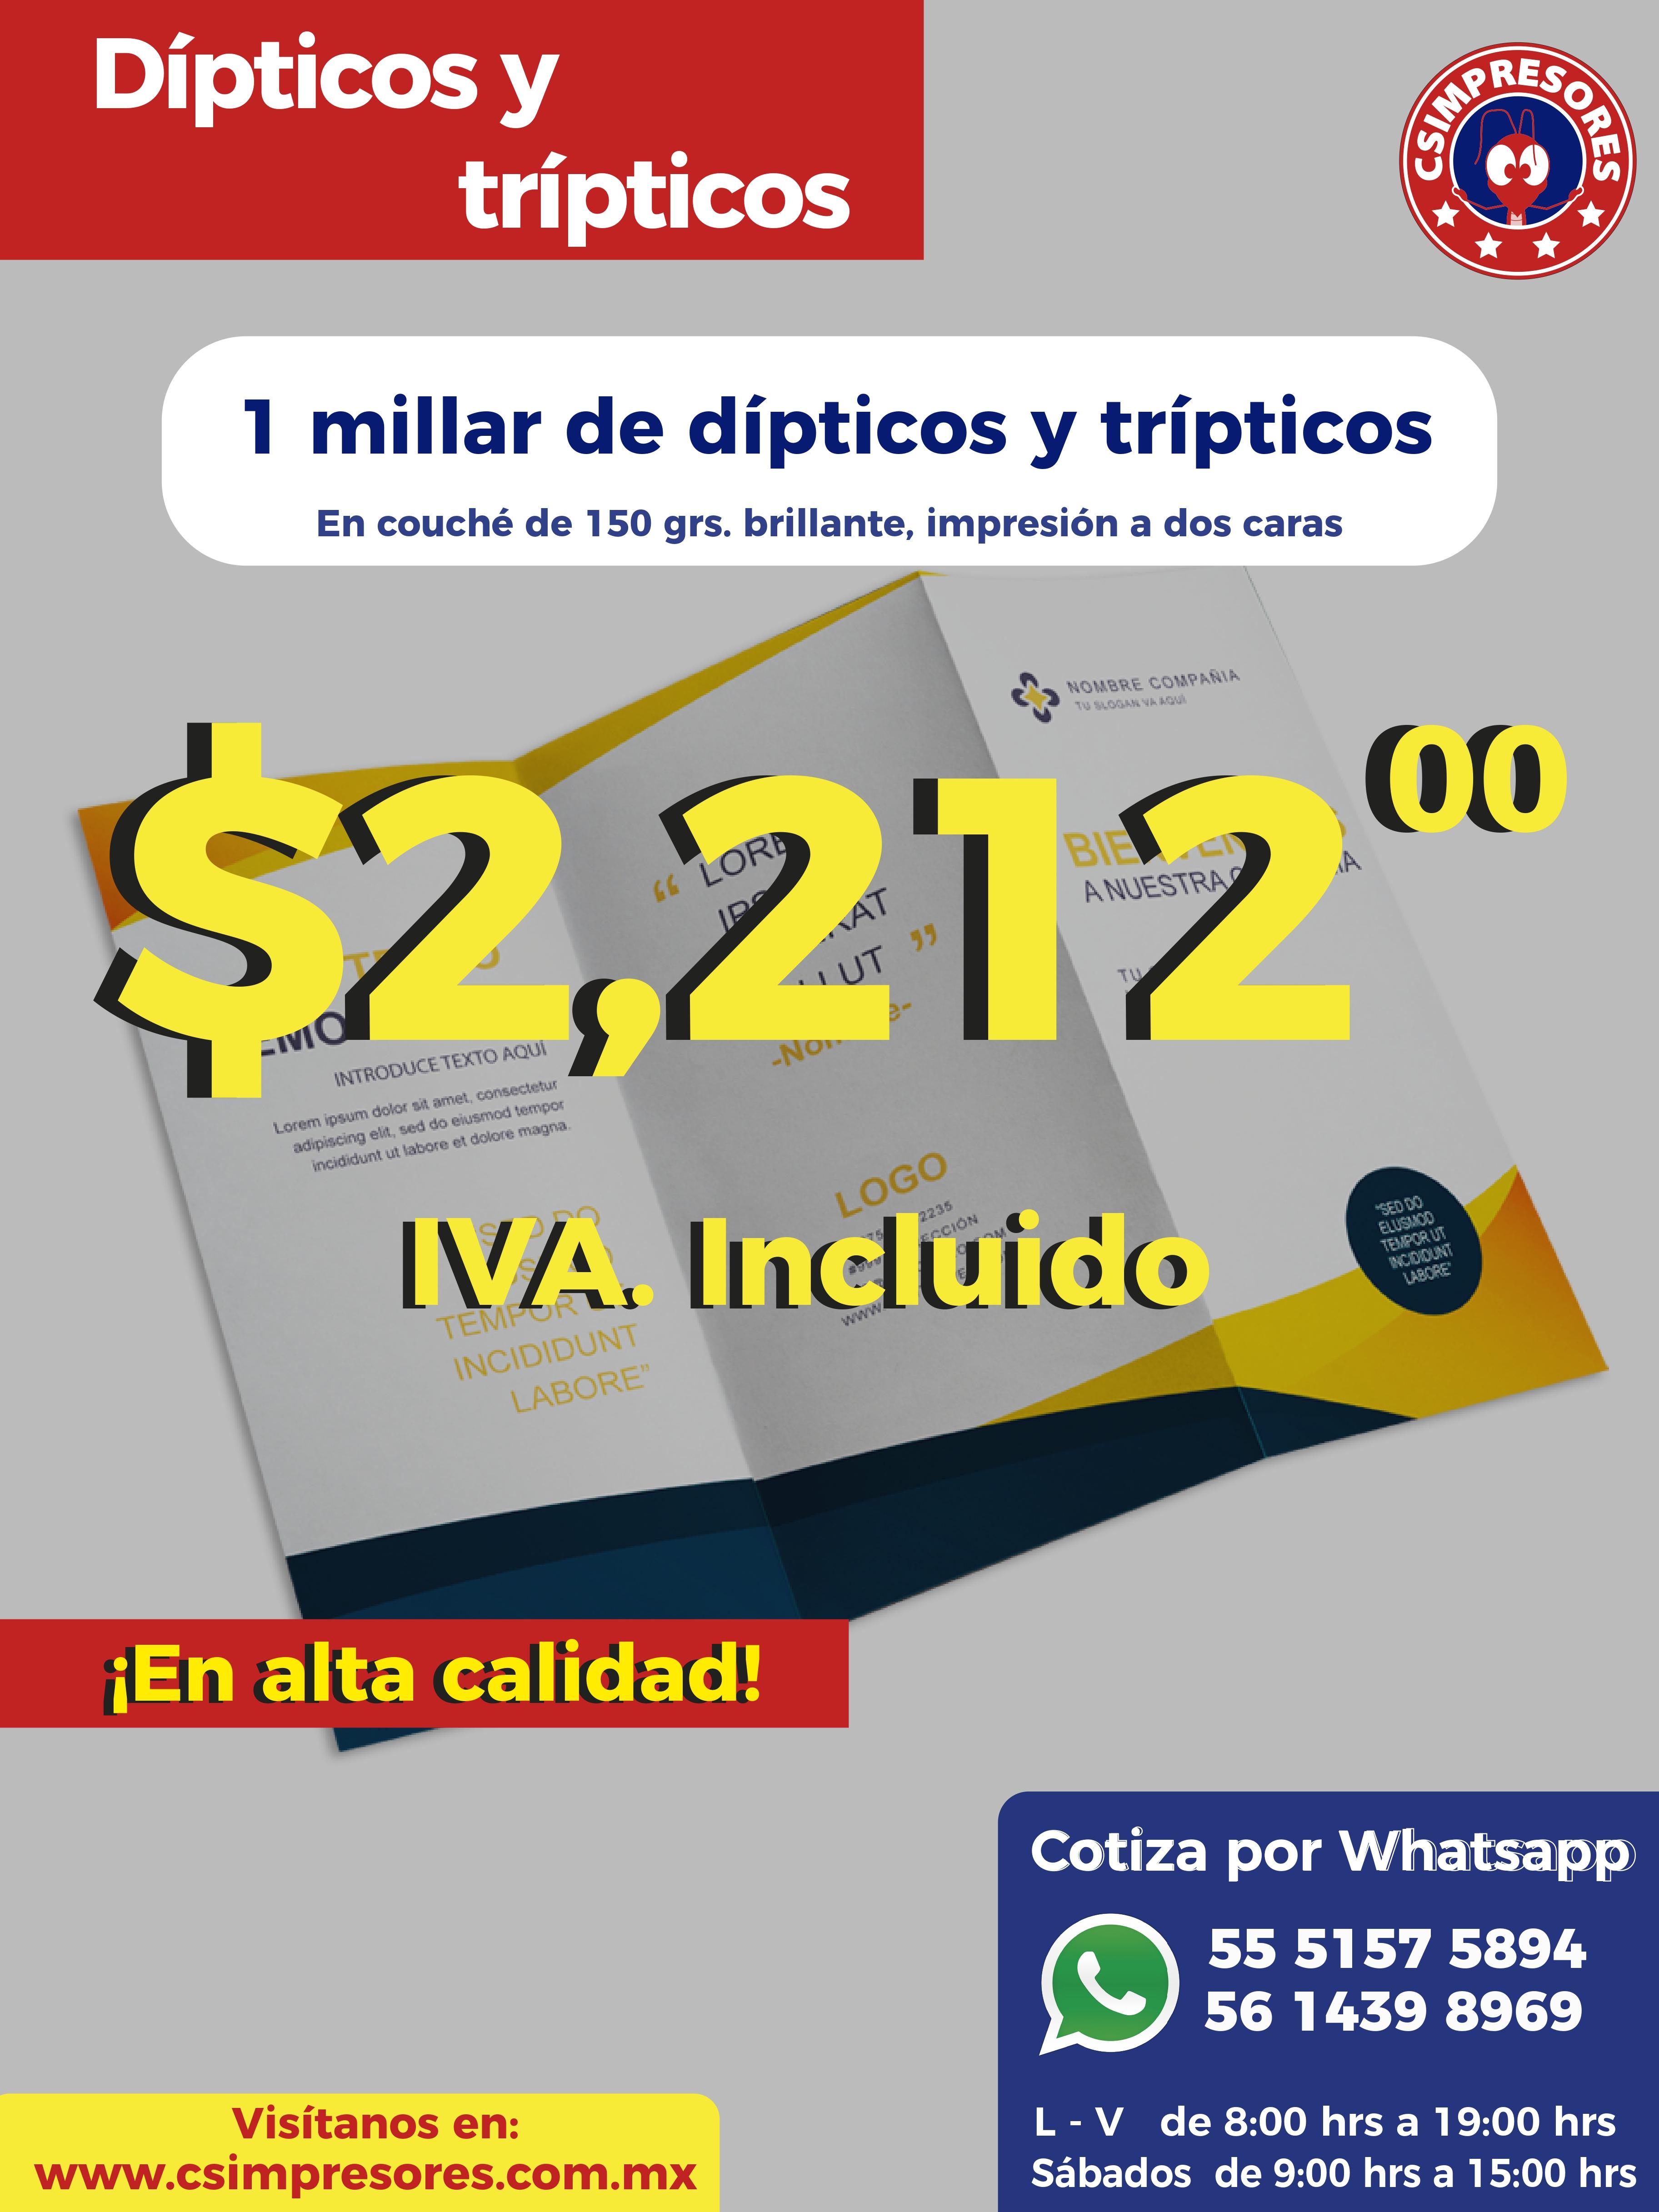 https://0201.nccdn.net/1_2/000/000/12e/f63/contenido-13-facebook-dipticos-y-tripticos_page-0001.jpg